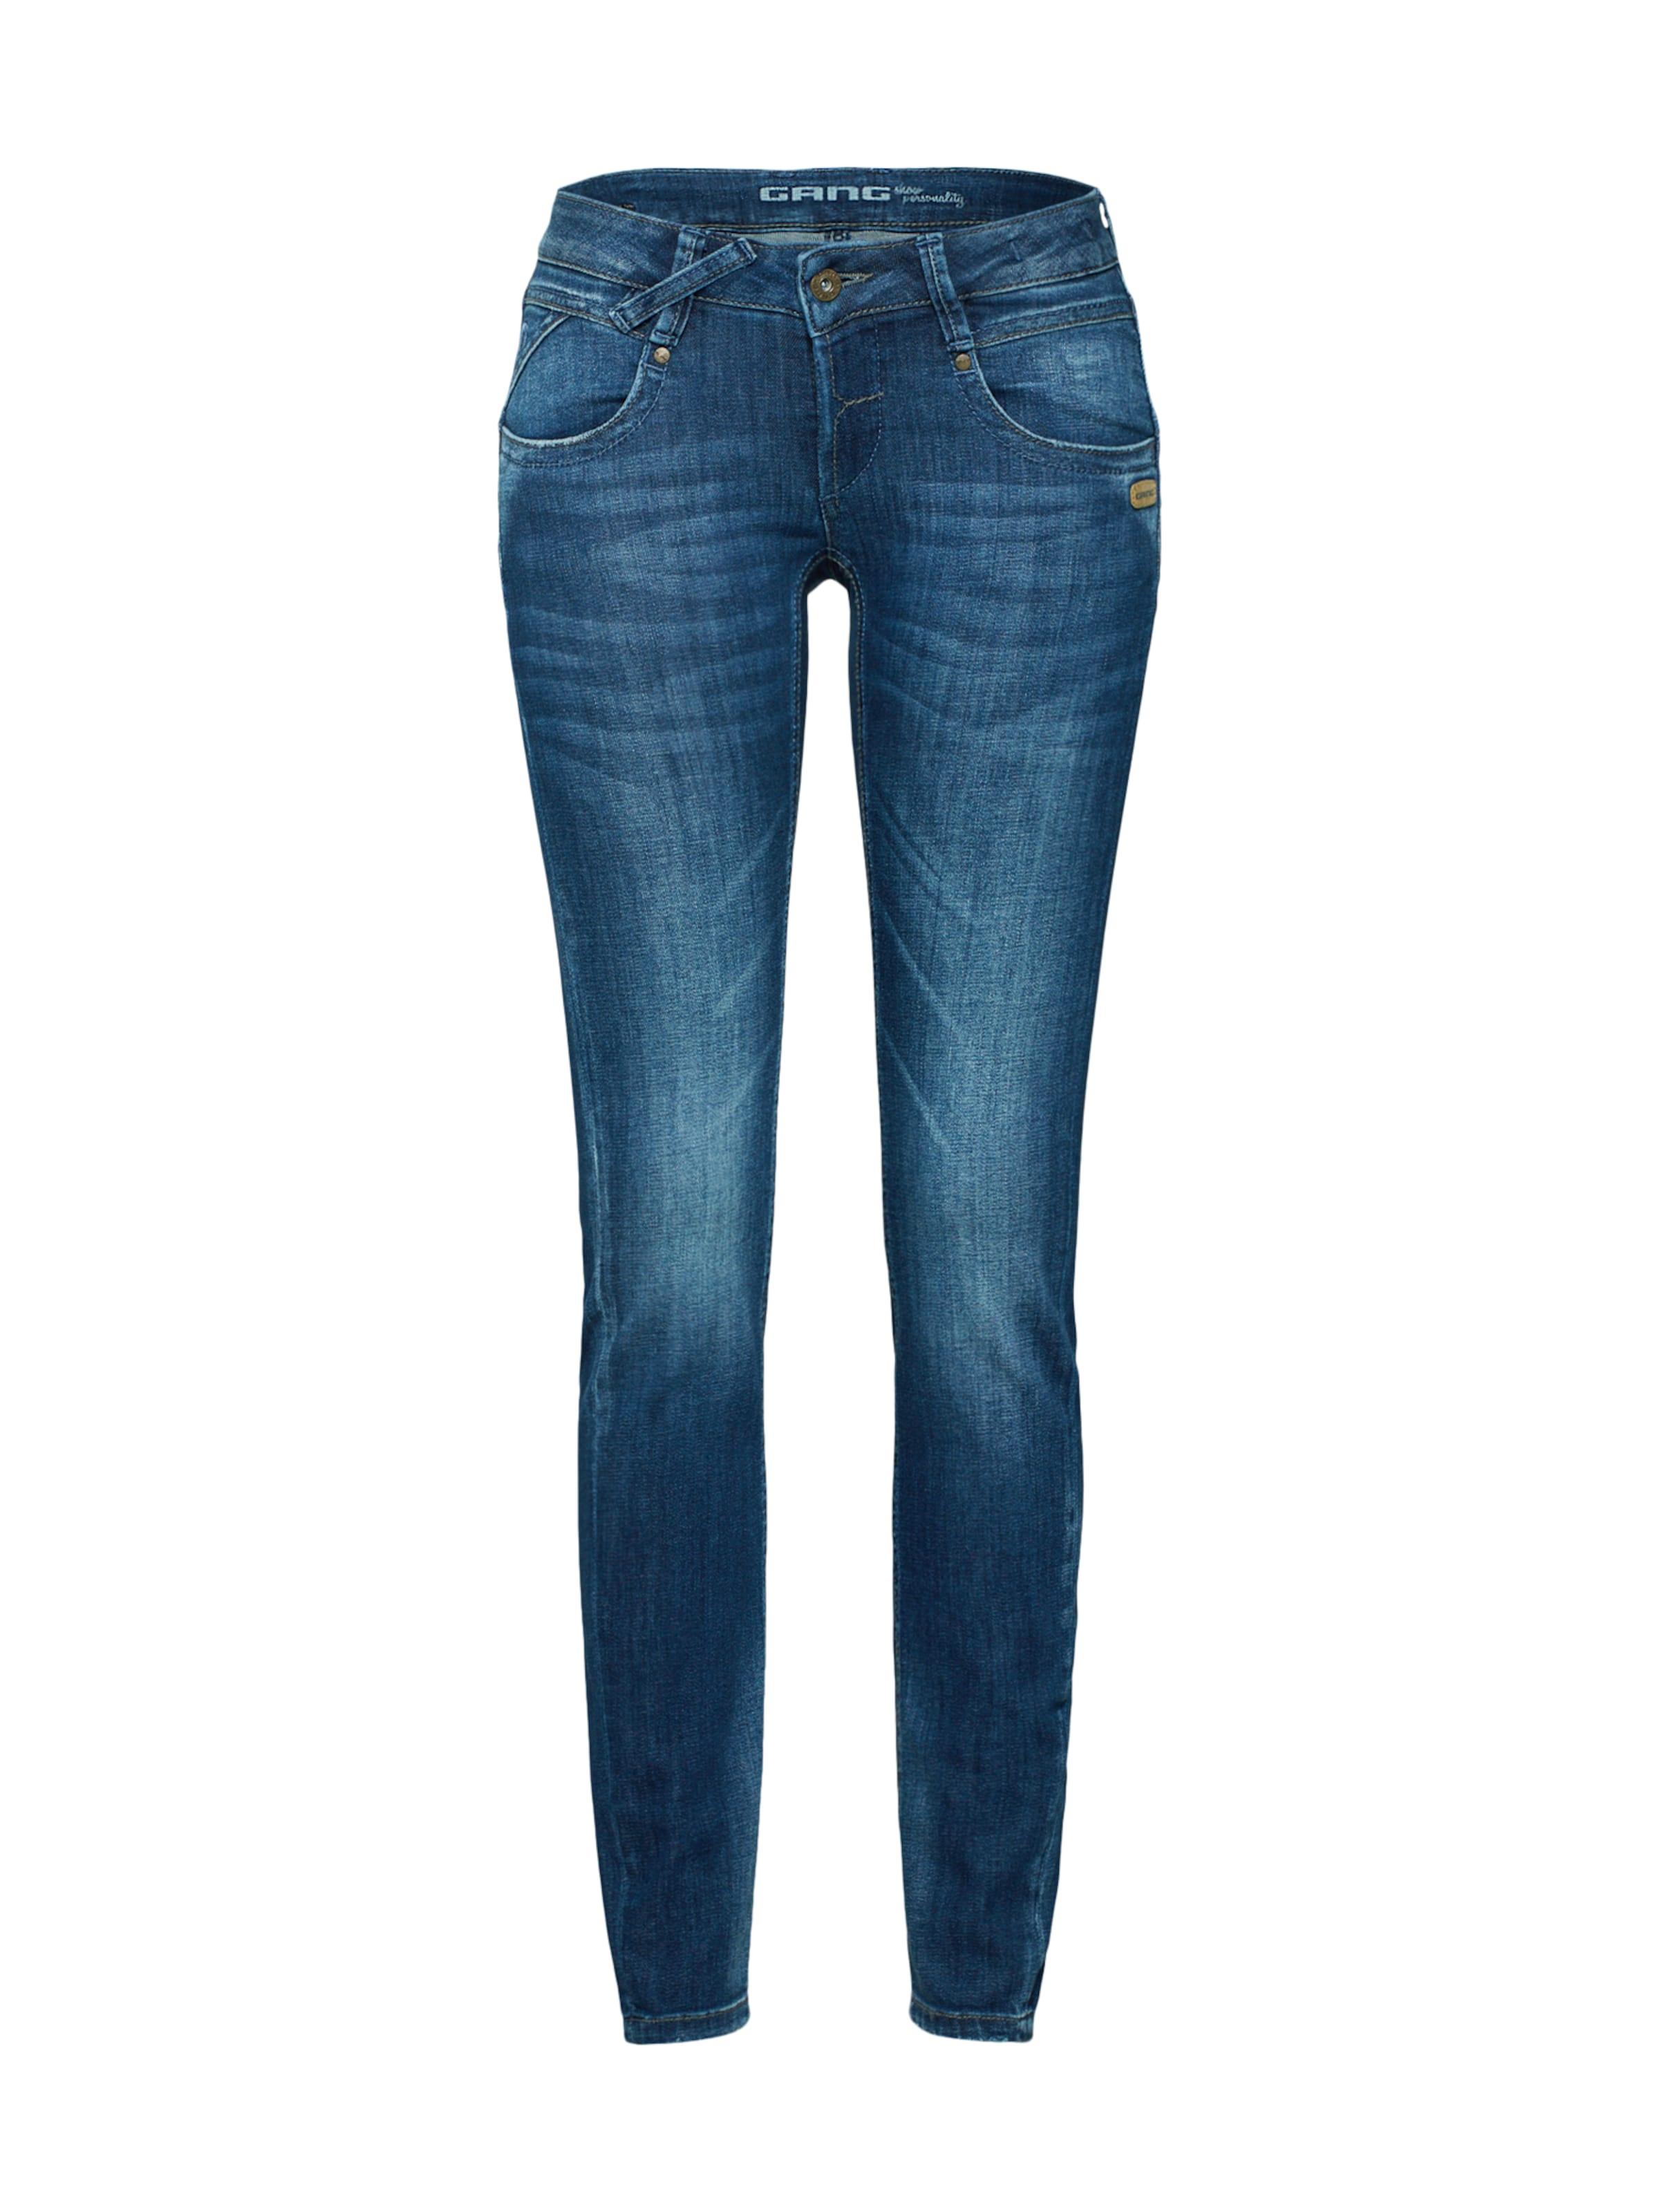 Blauw Denim Gang 'nena' Jeans In uwkXZiTPO